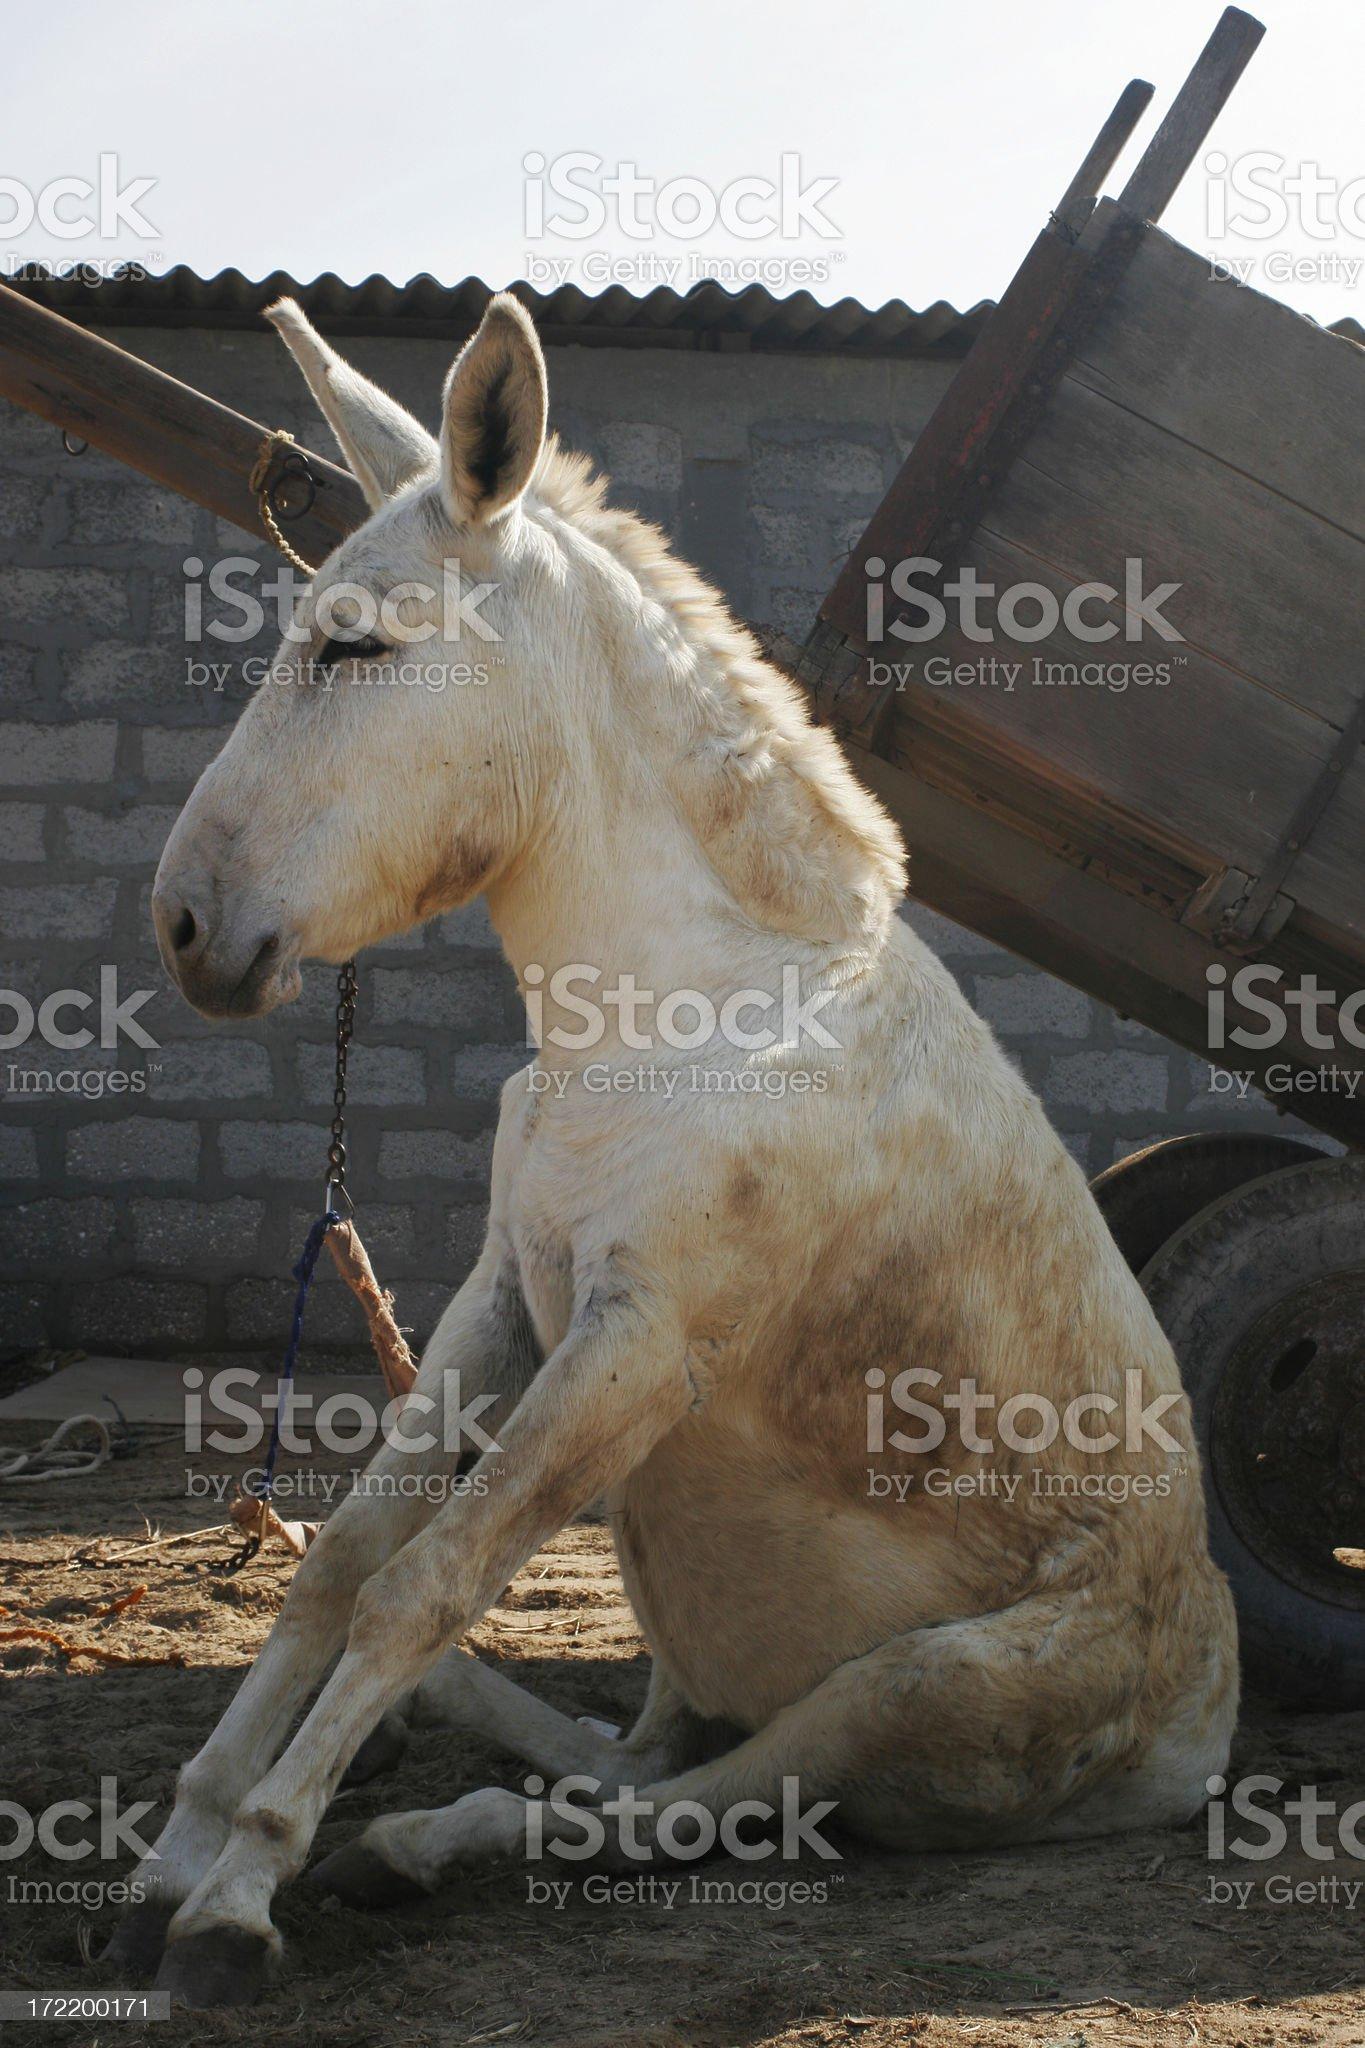 Donkey and Cart royalty-free stock photo